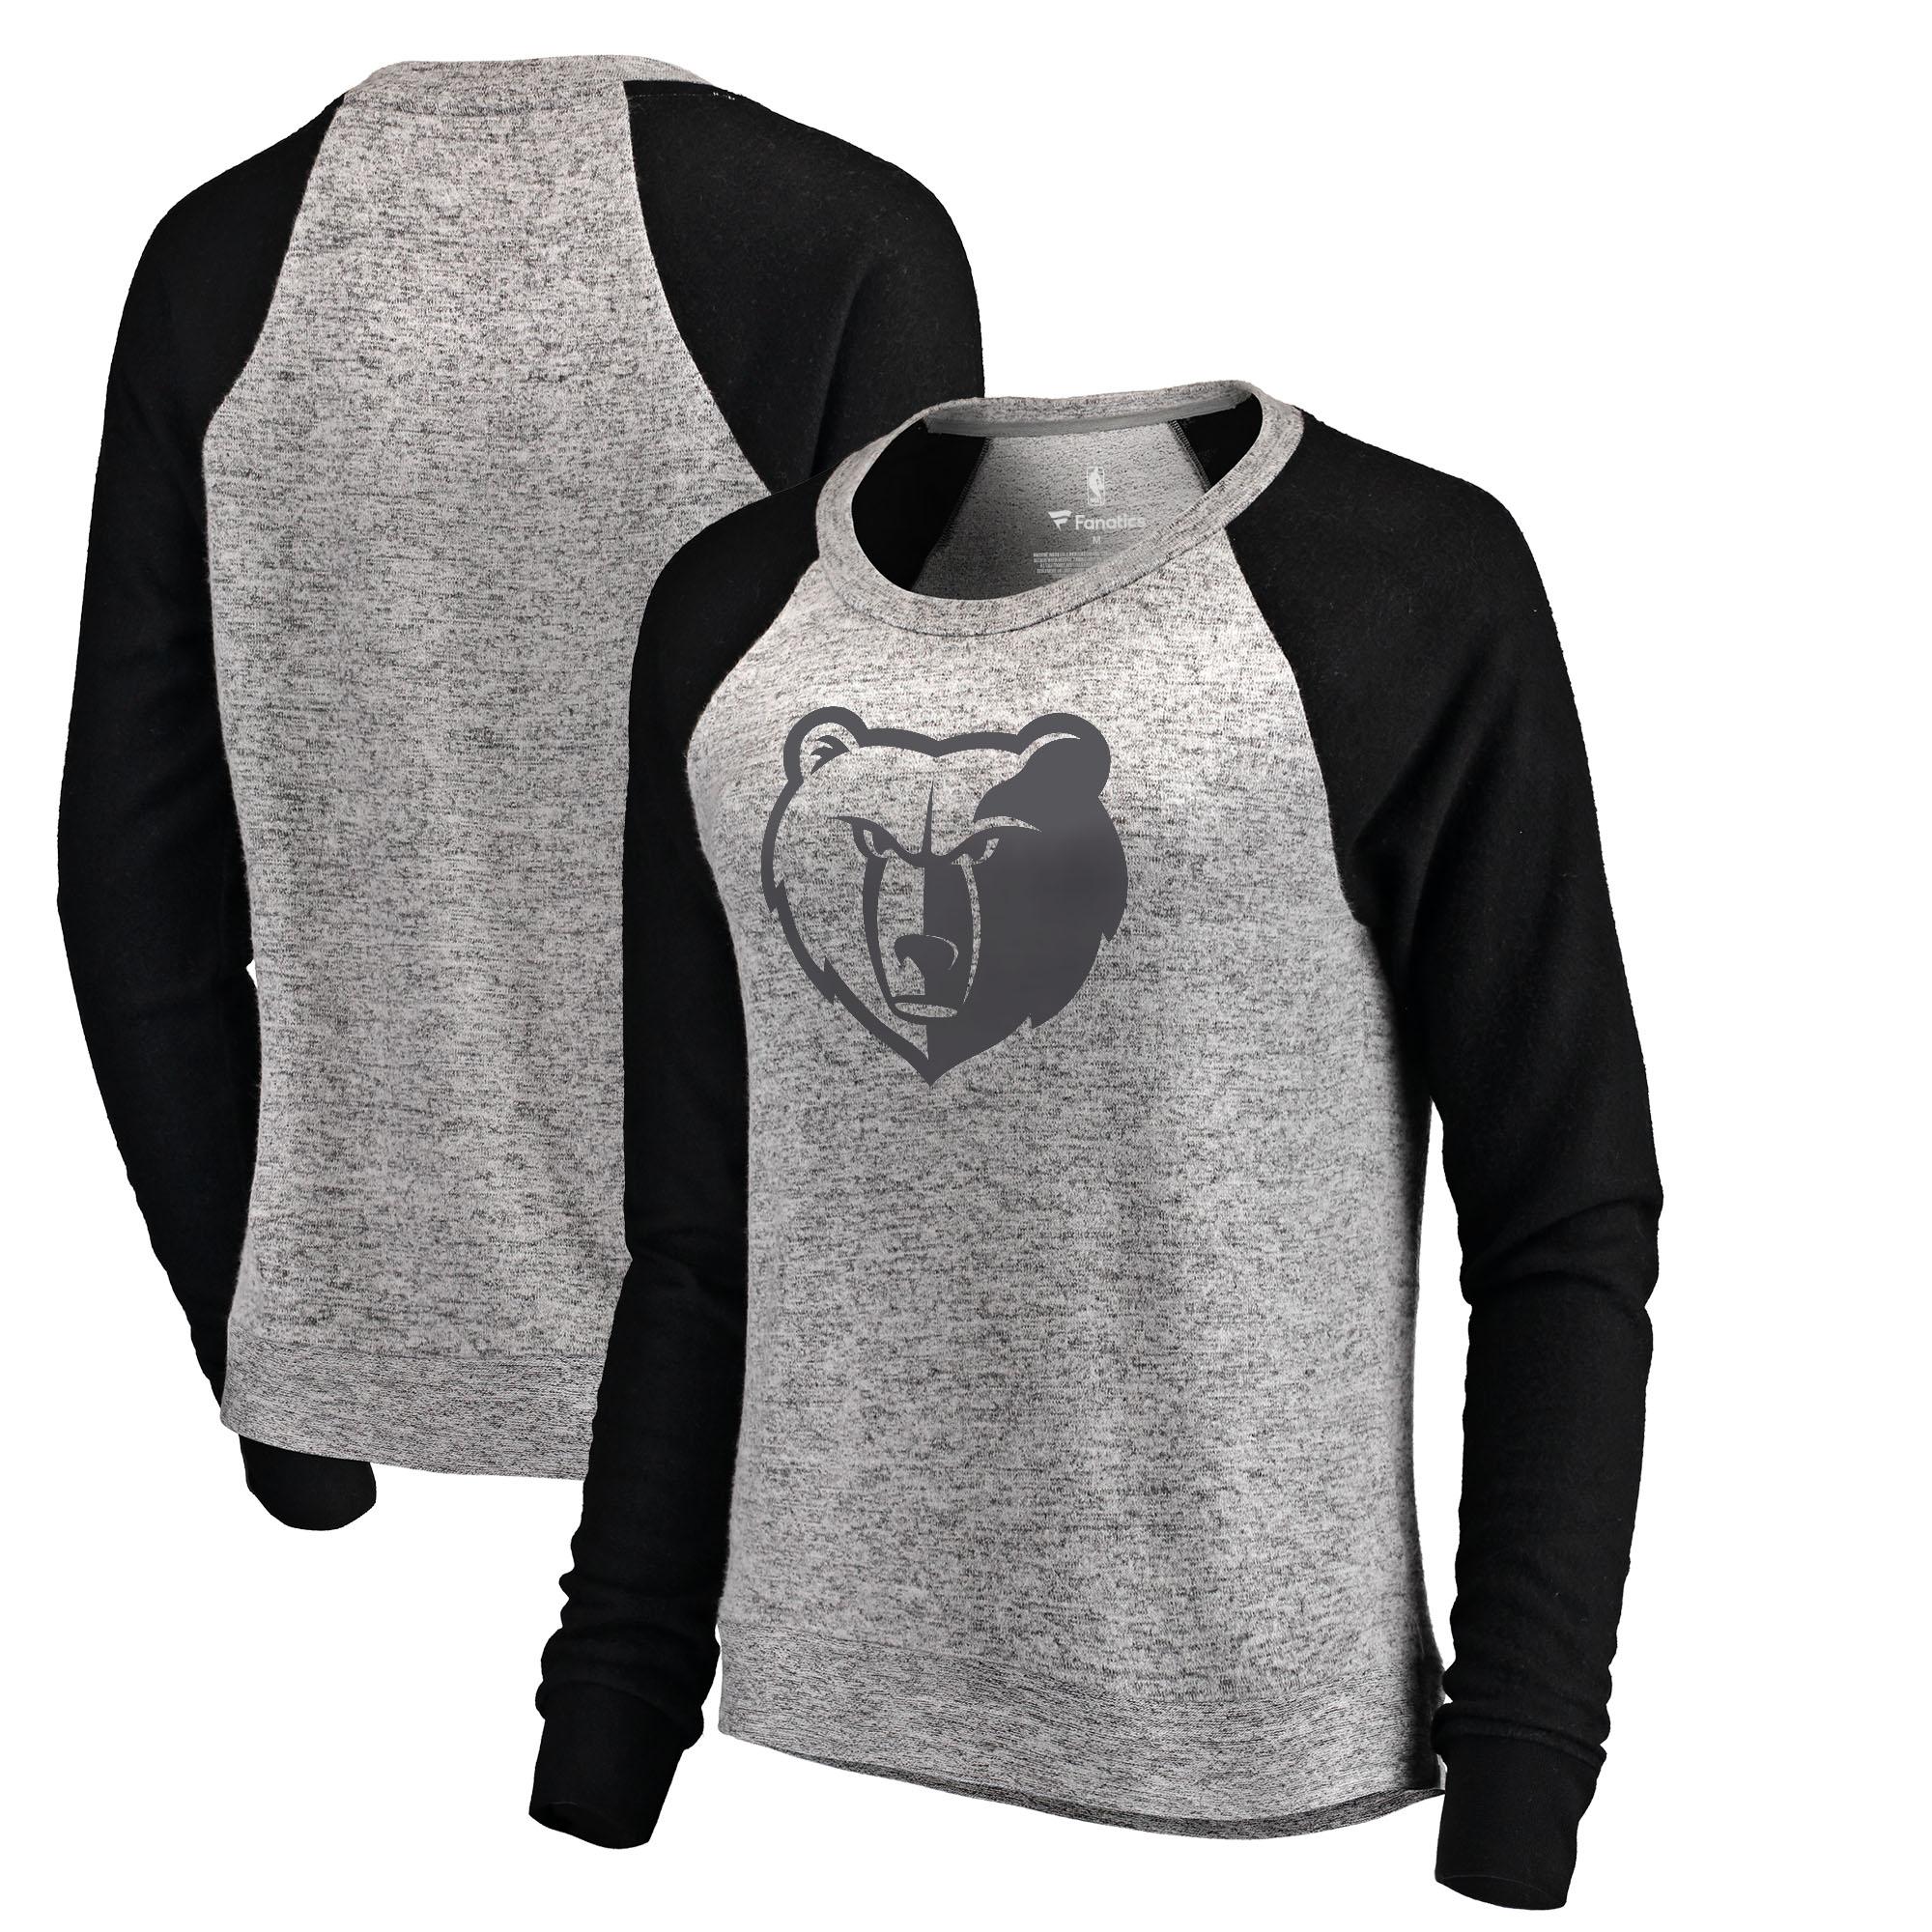 Memphis Grizzlies Let Loose by RNL Women's Cozy Collection Plush Raglan Crew Neck Sweatshirt - Ash/Black